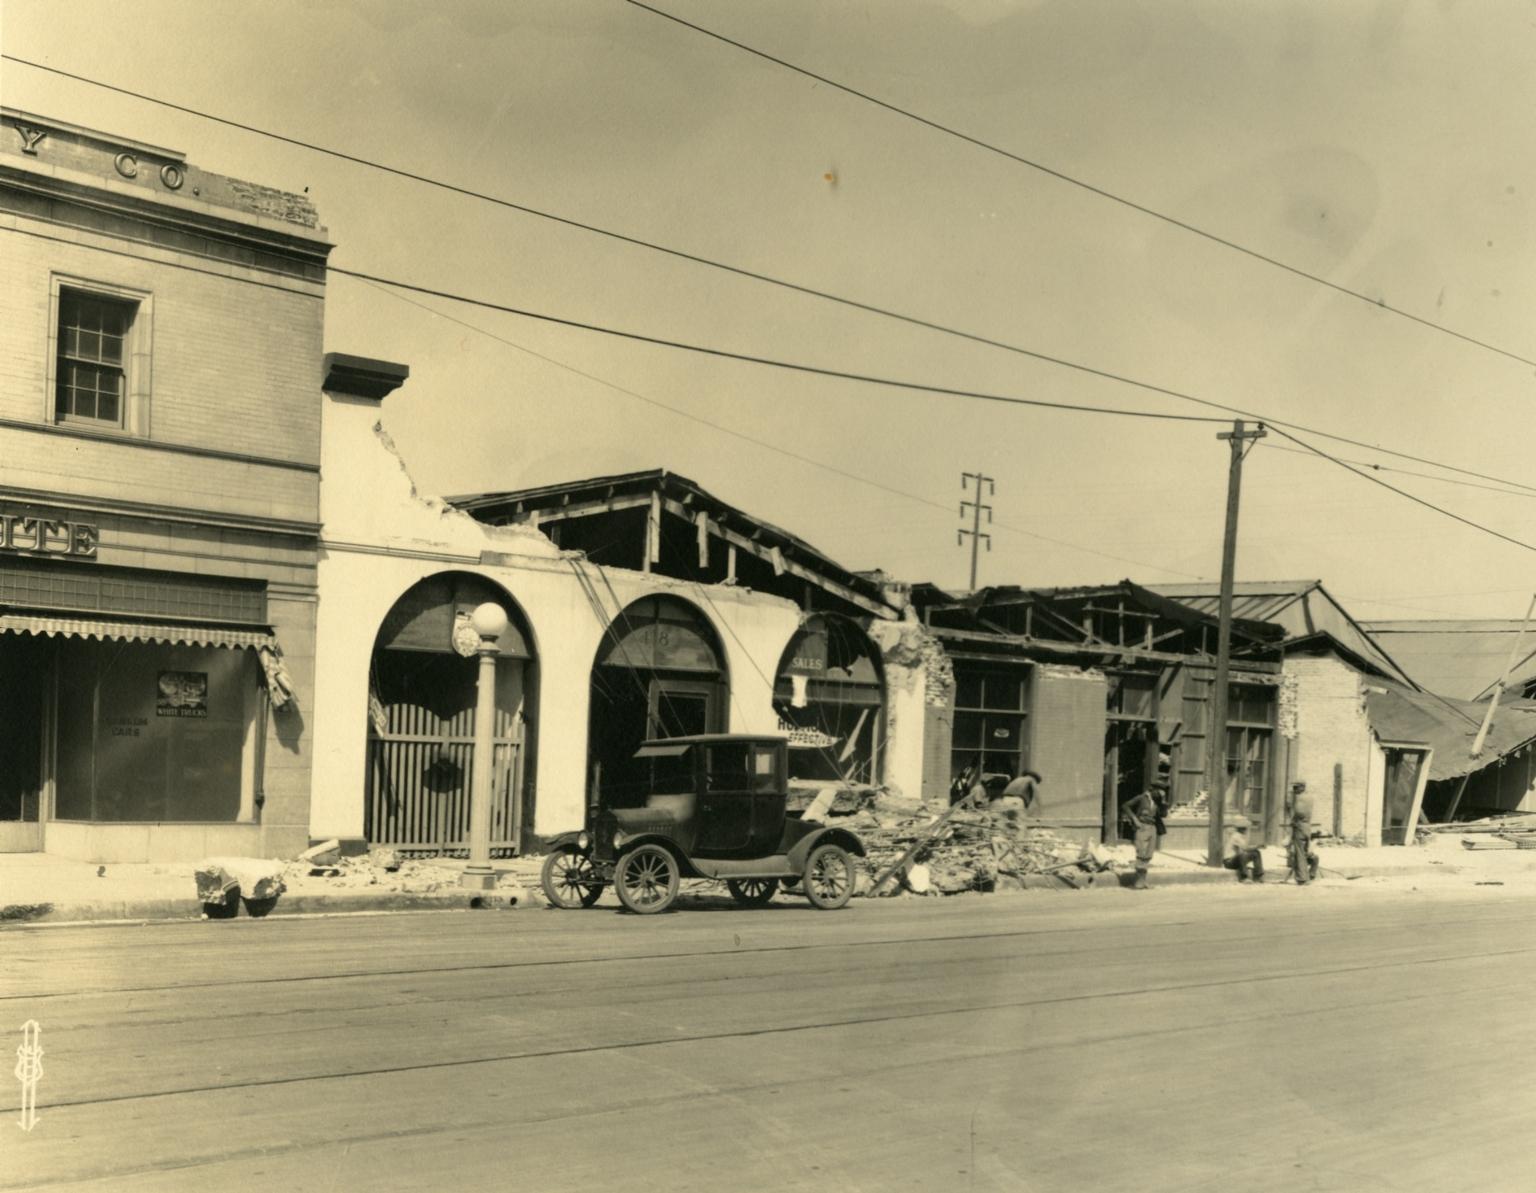 Santa Barbara 1925 Earthquake Damage - 400 Block State Street